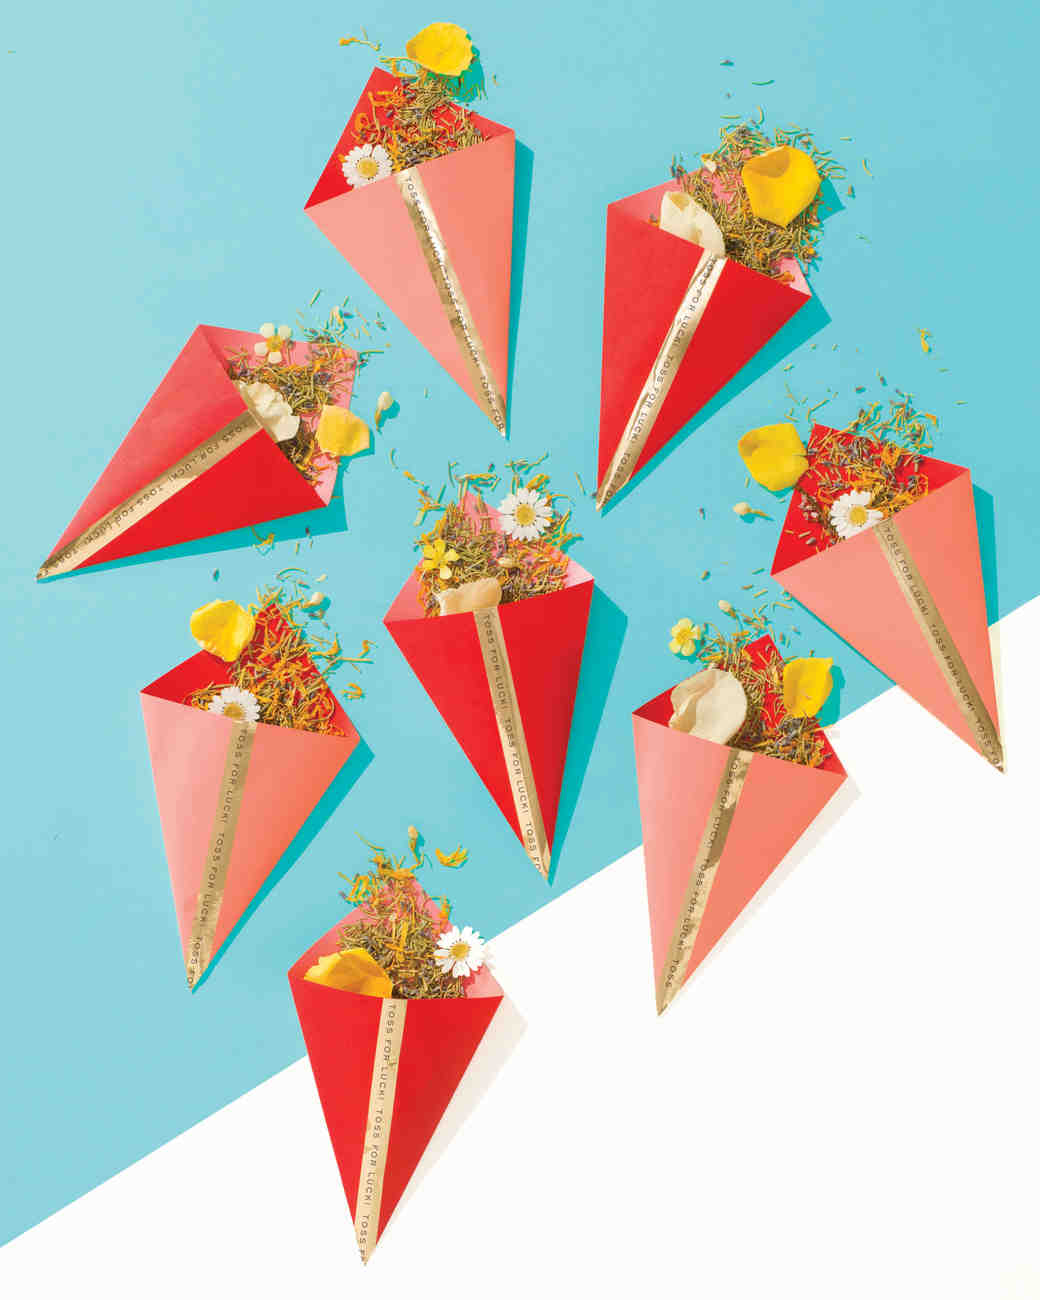 wedding send off ideas 32 Stunning Wedding Centerpieces Ideas